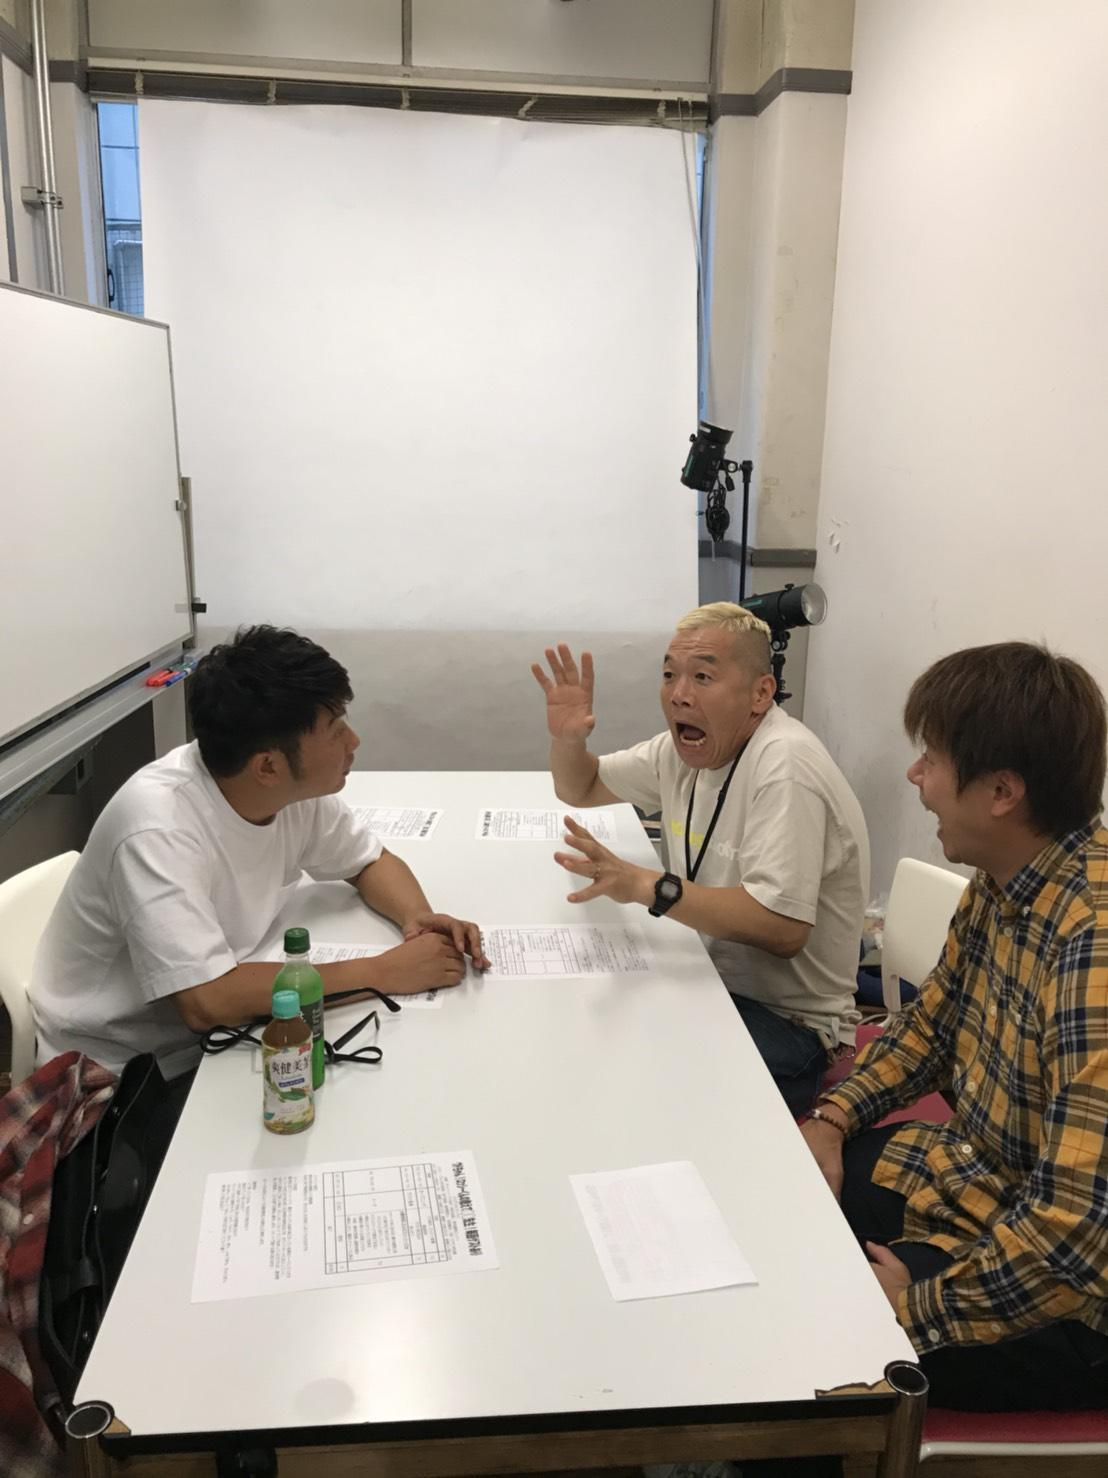 http://news.yoshimoto.co.jp/20181010153301-0ea8eff3324f278018cec041f03f38180ef55f9a.jpg